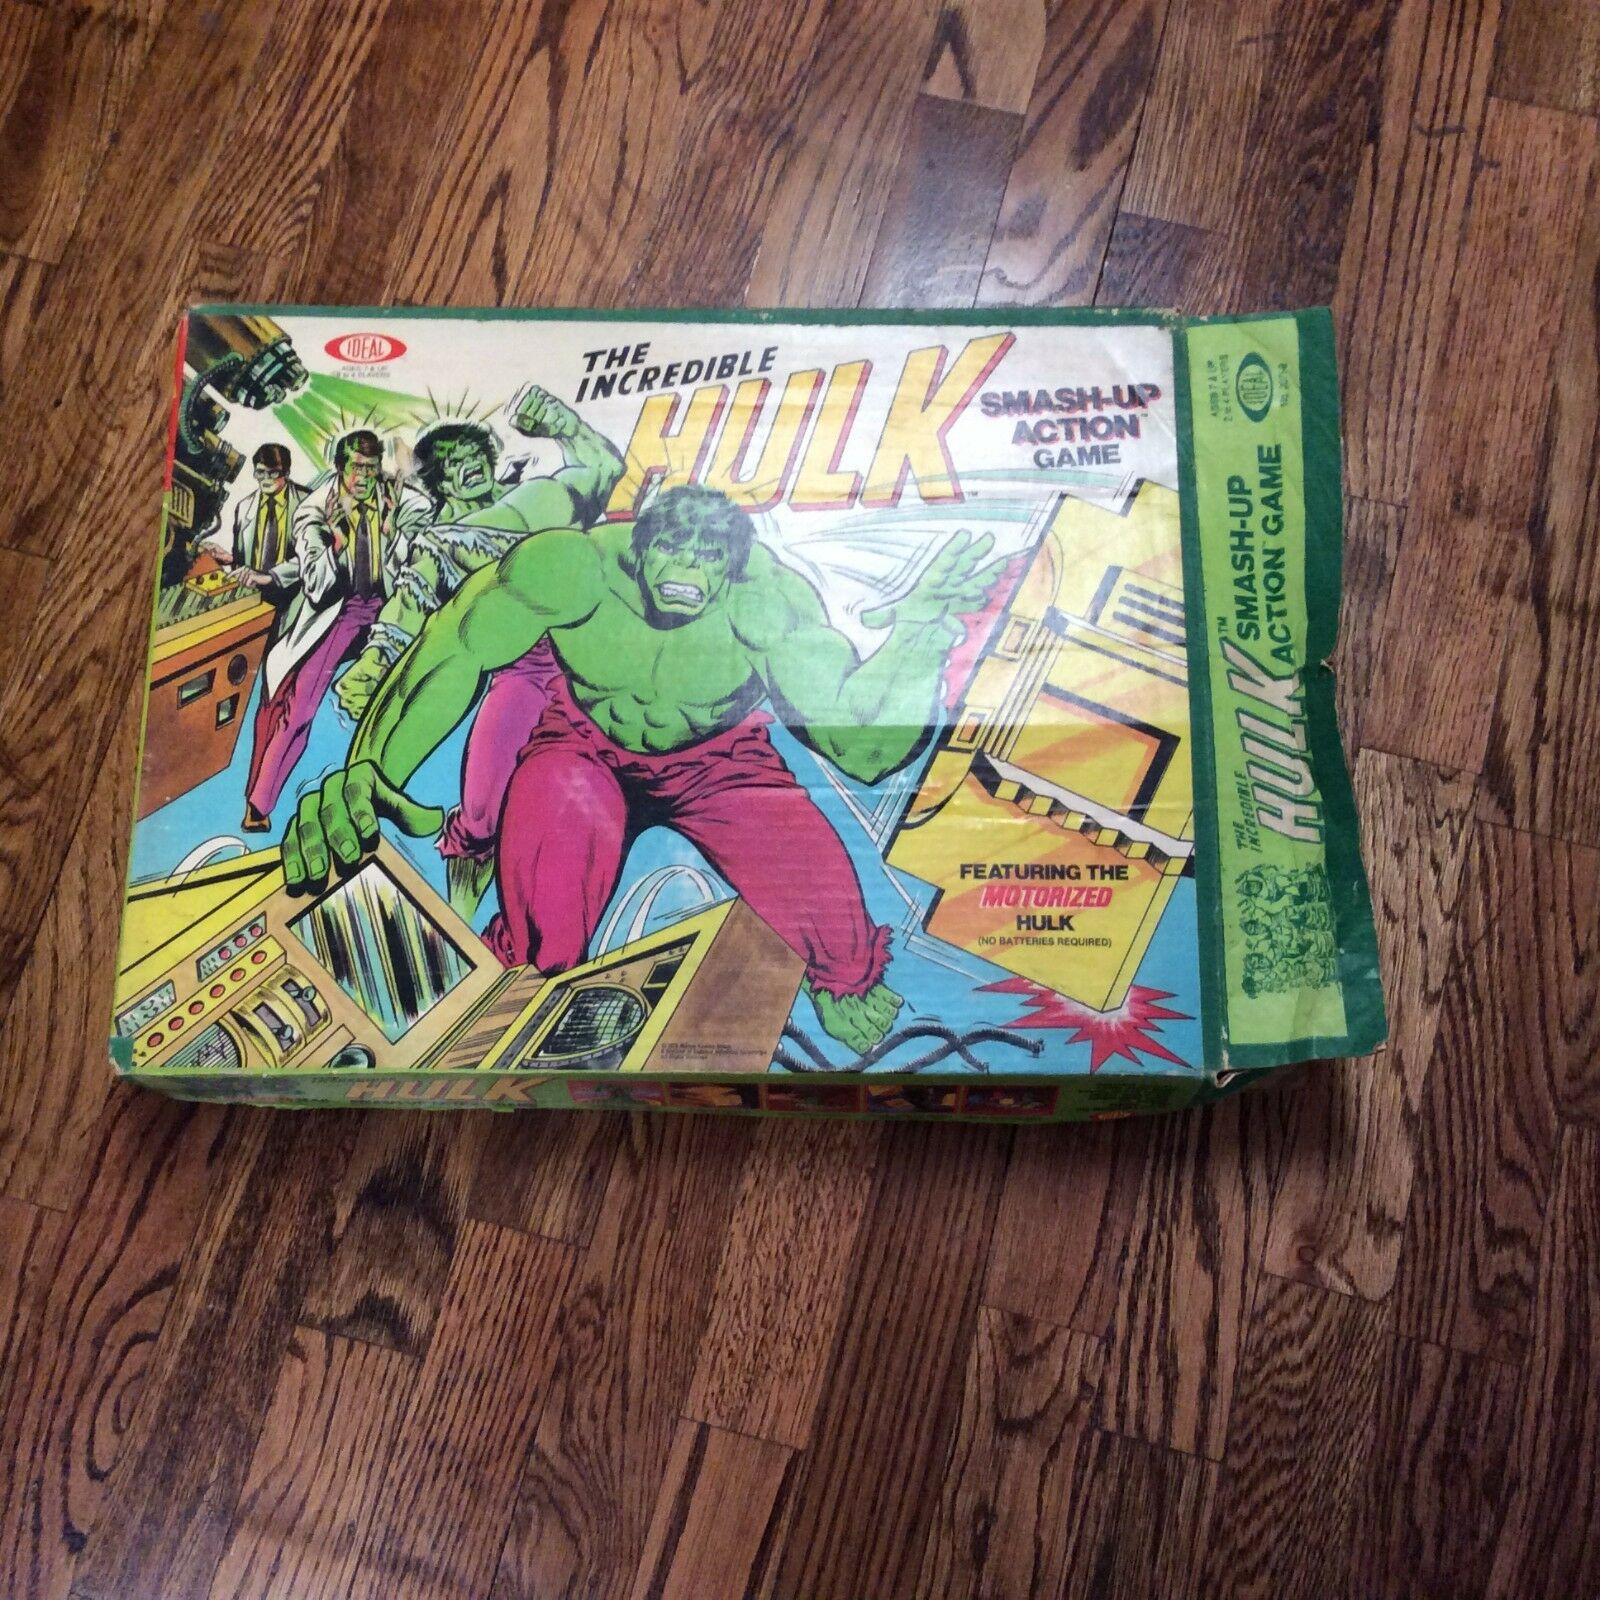 Vintage Vintage Vintage The IncROTible Hulk Smash Up Action Game Ideal Toys 1979 7711fa